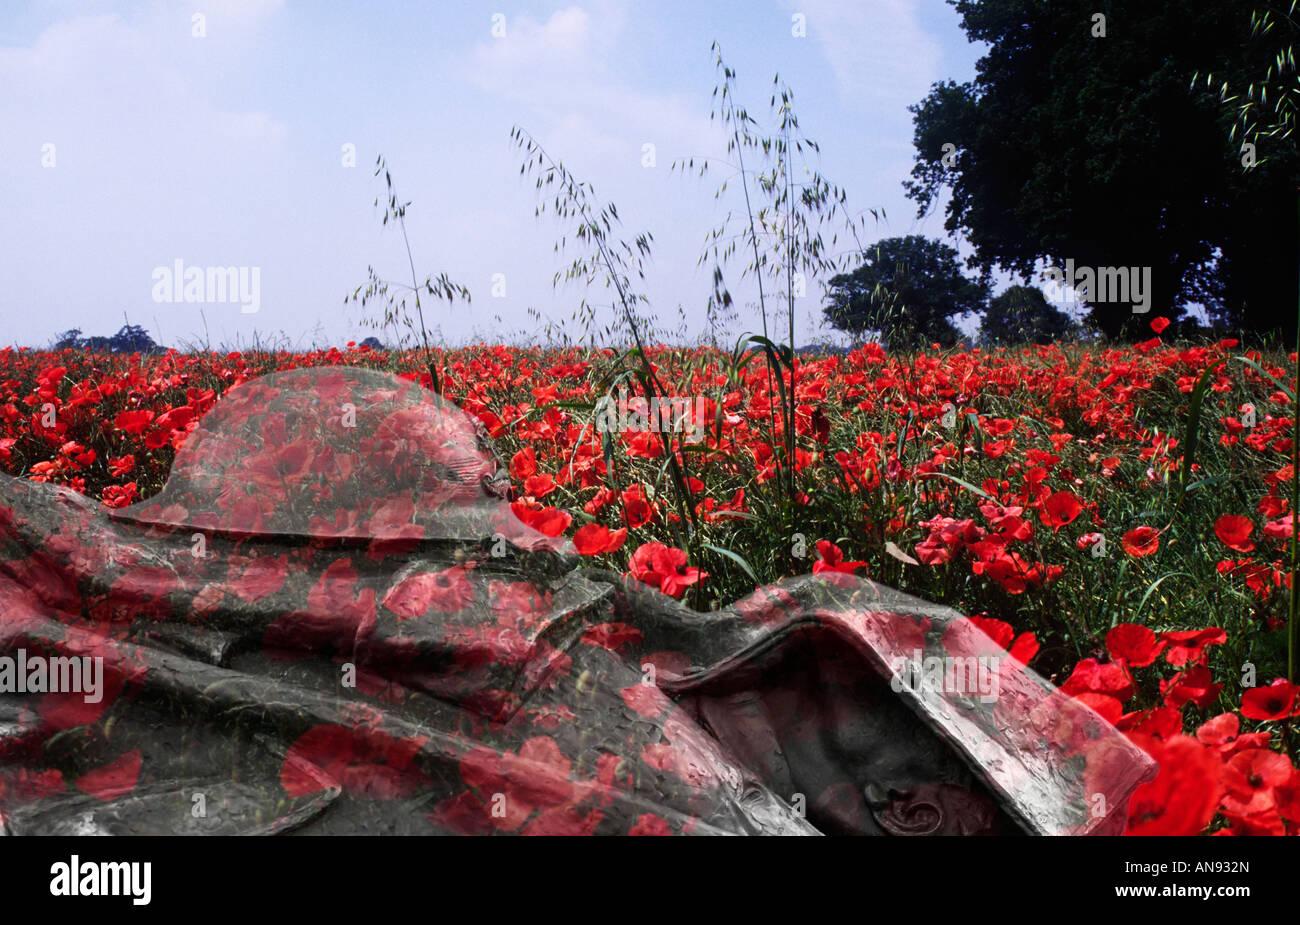 First World War montage - Stock Image